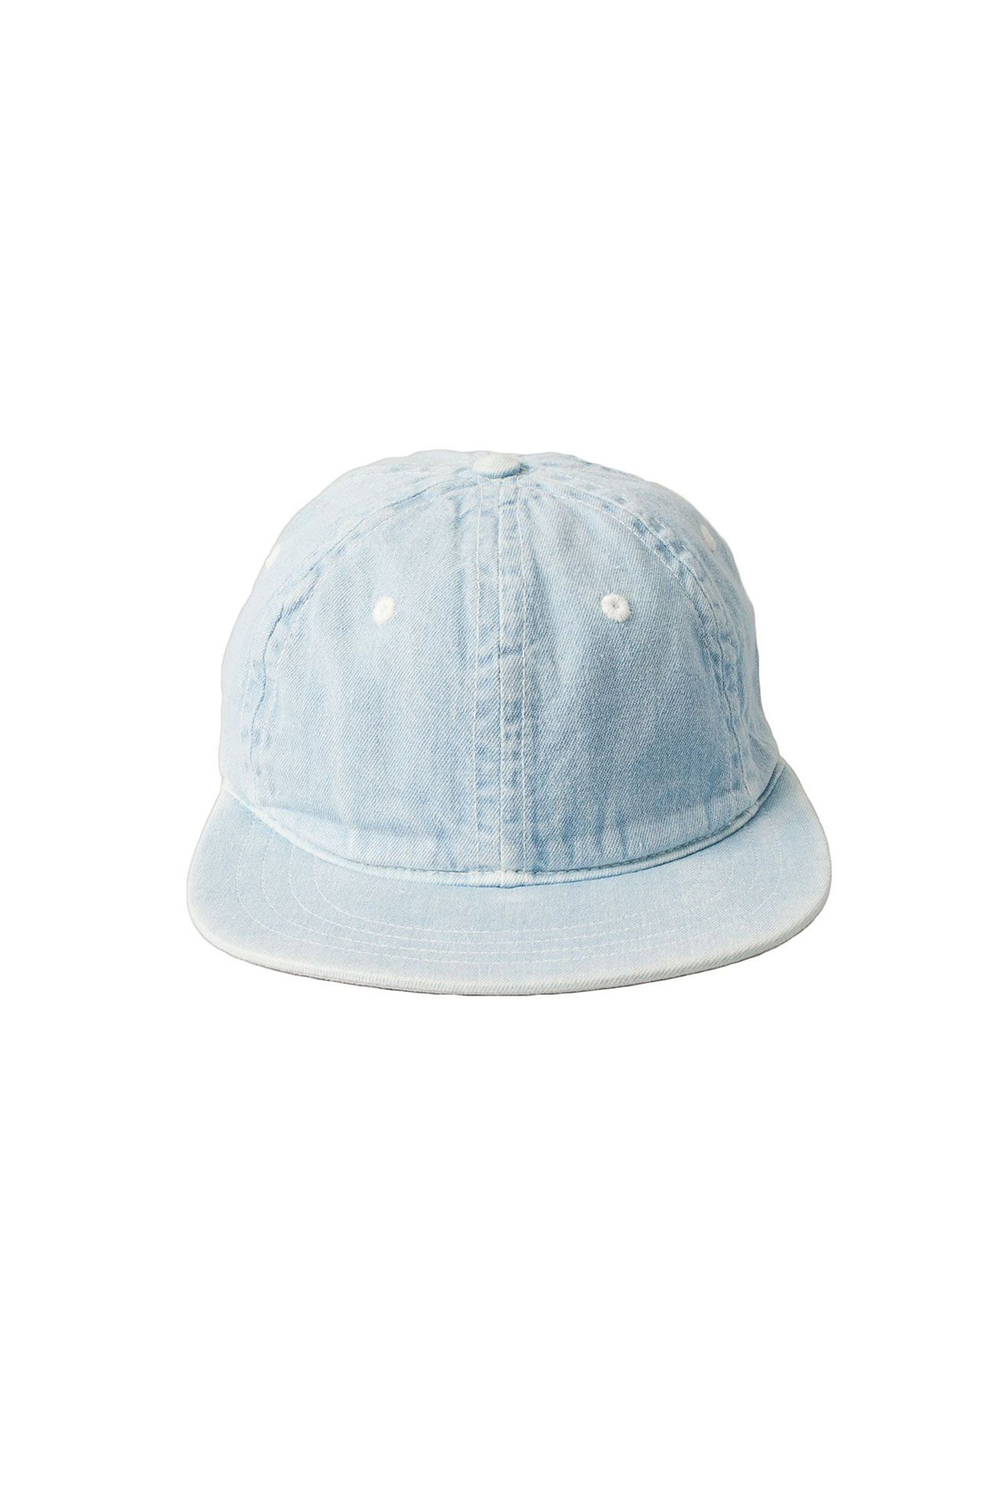 10-spring-denim-trends-hats-01.jpg